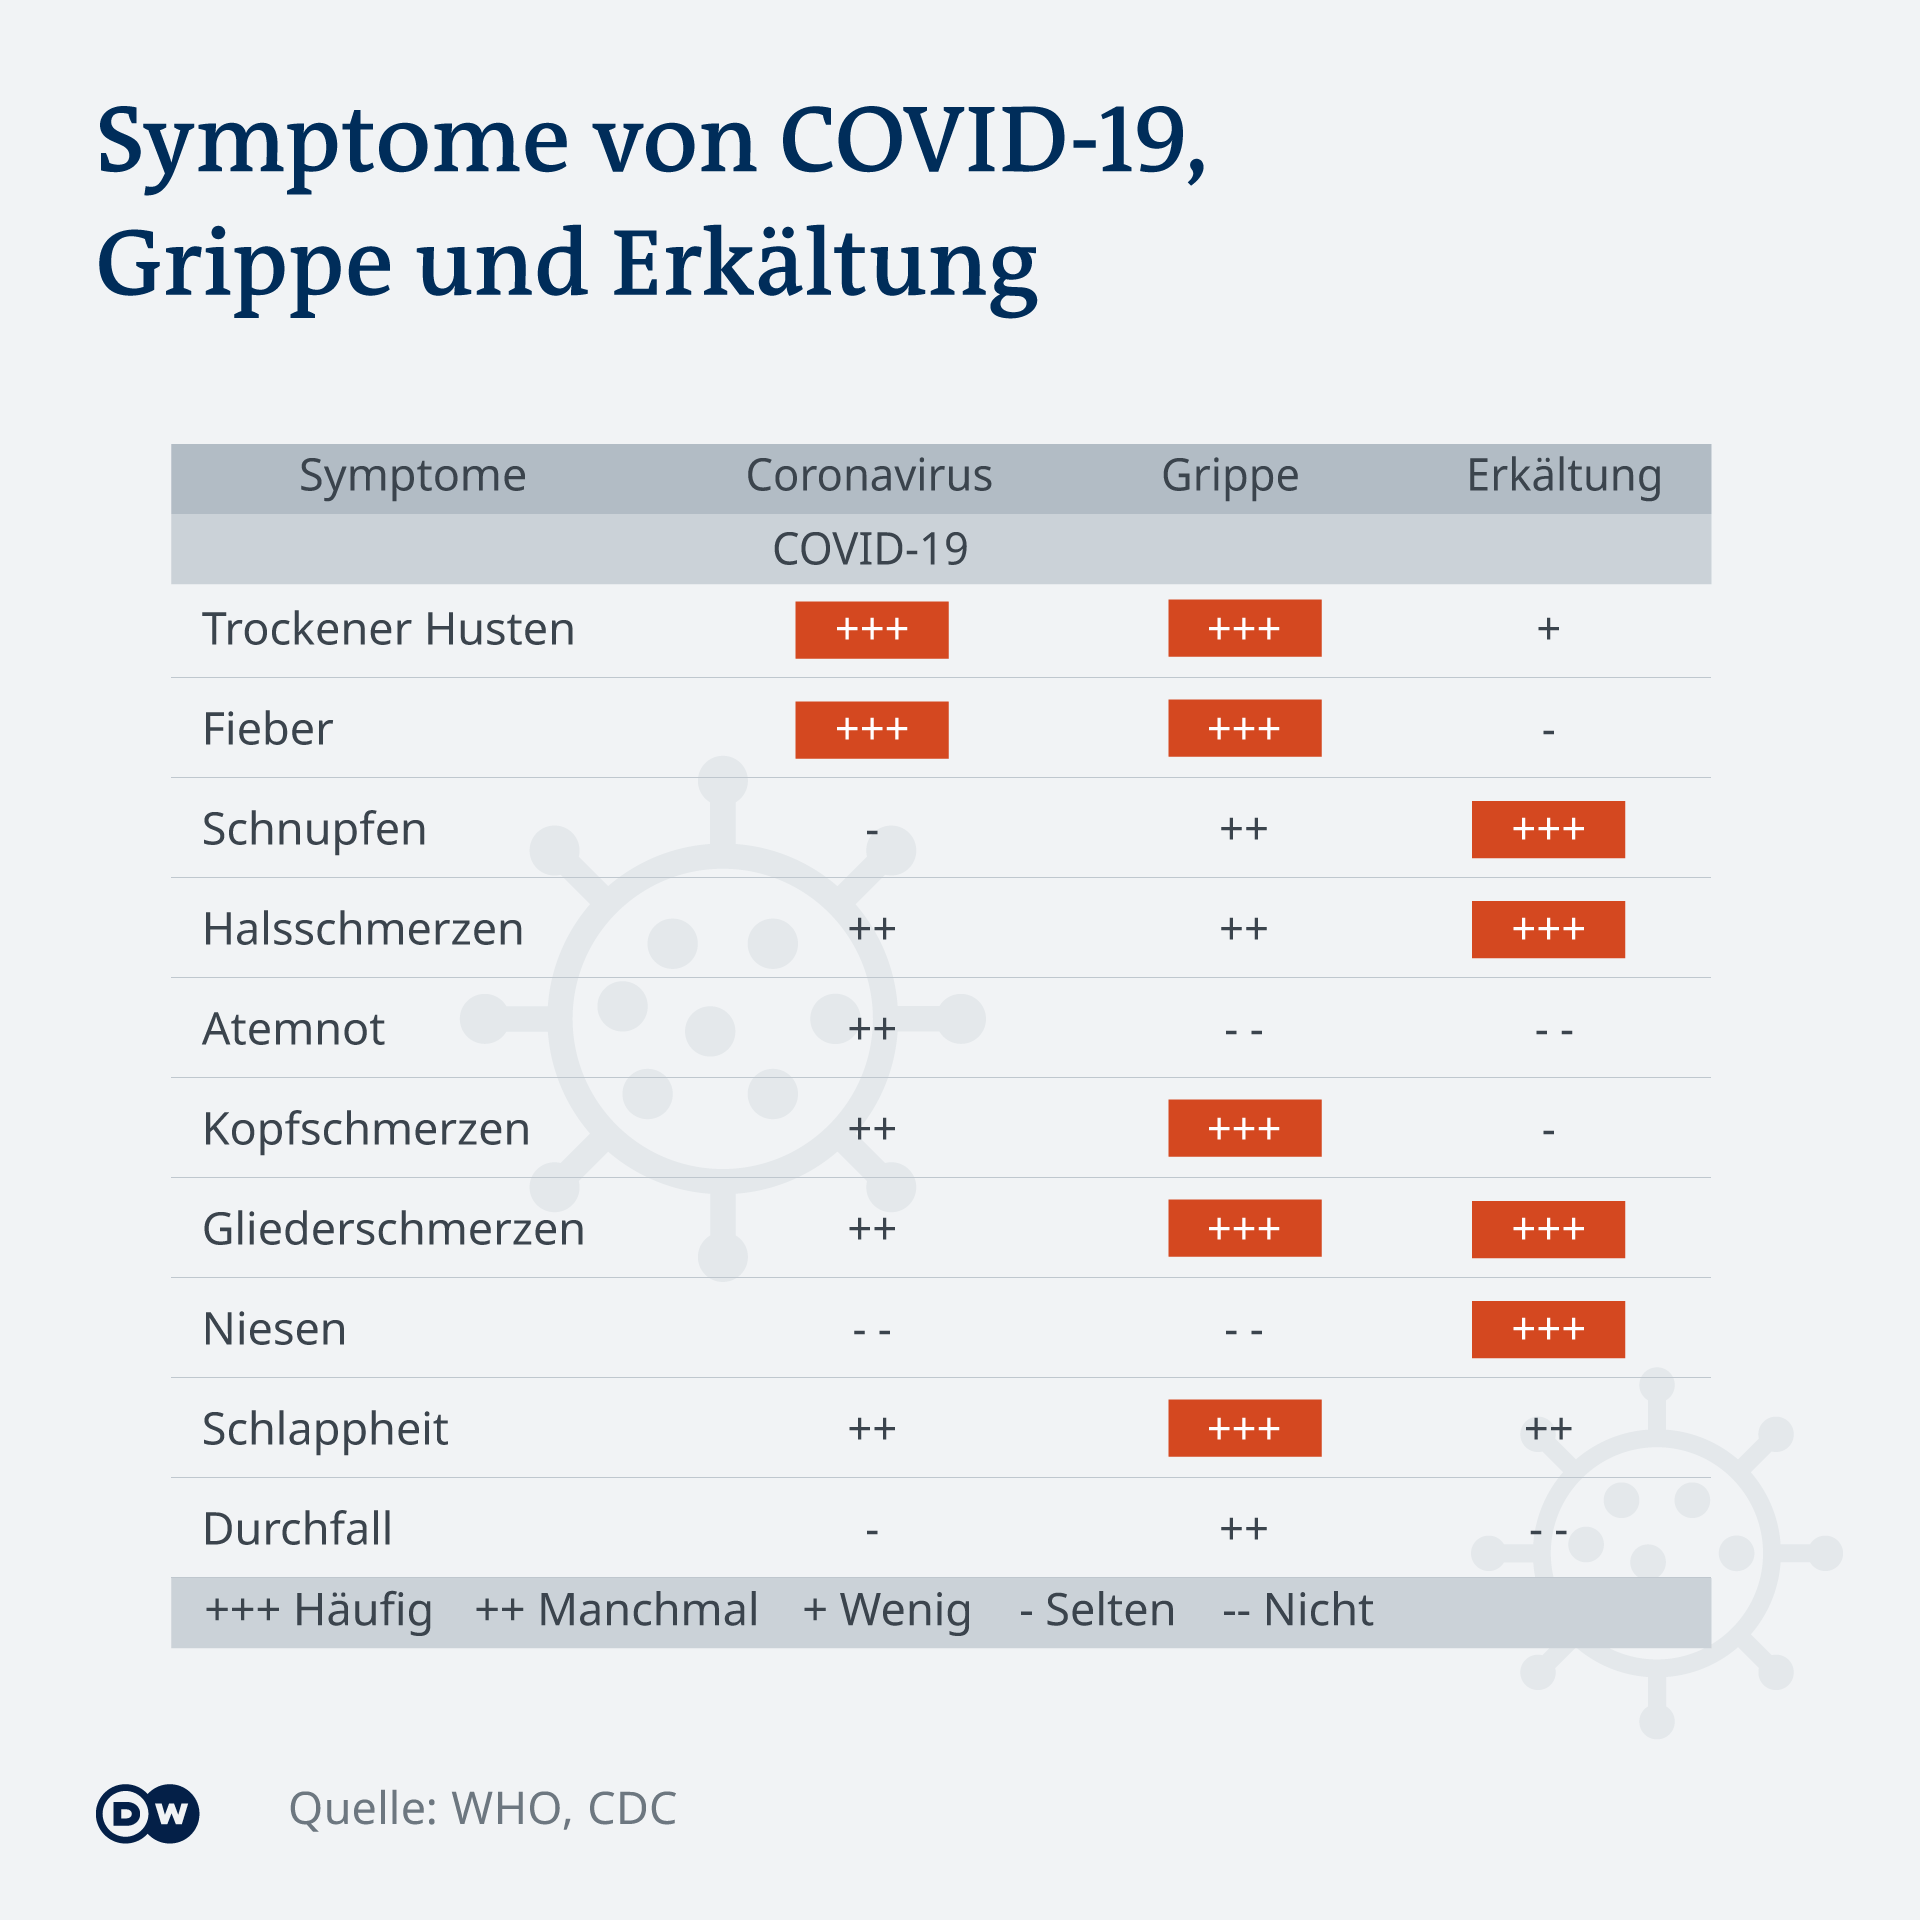 Corona Symptome Vergleich Grippe